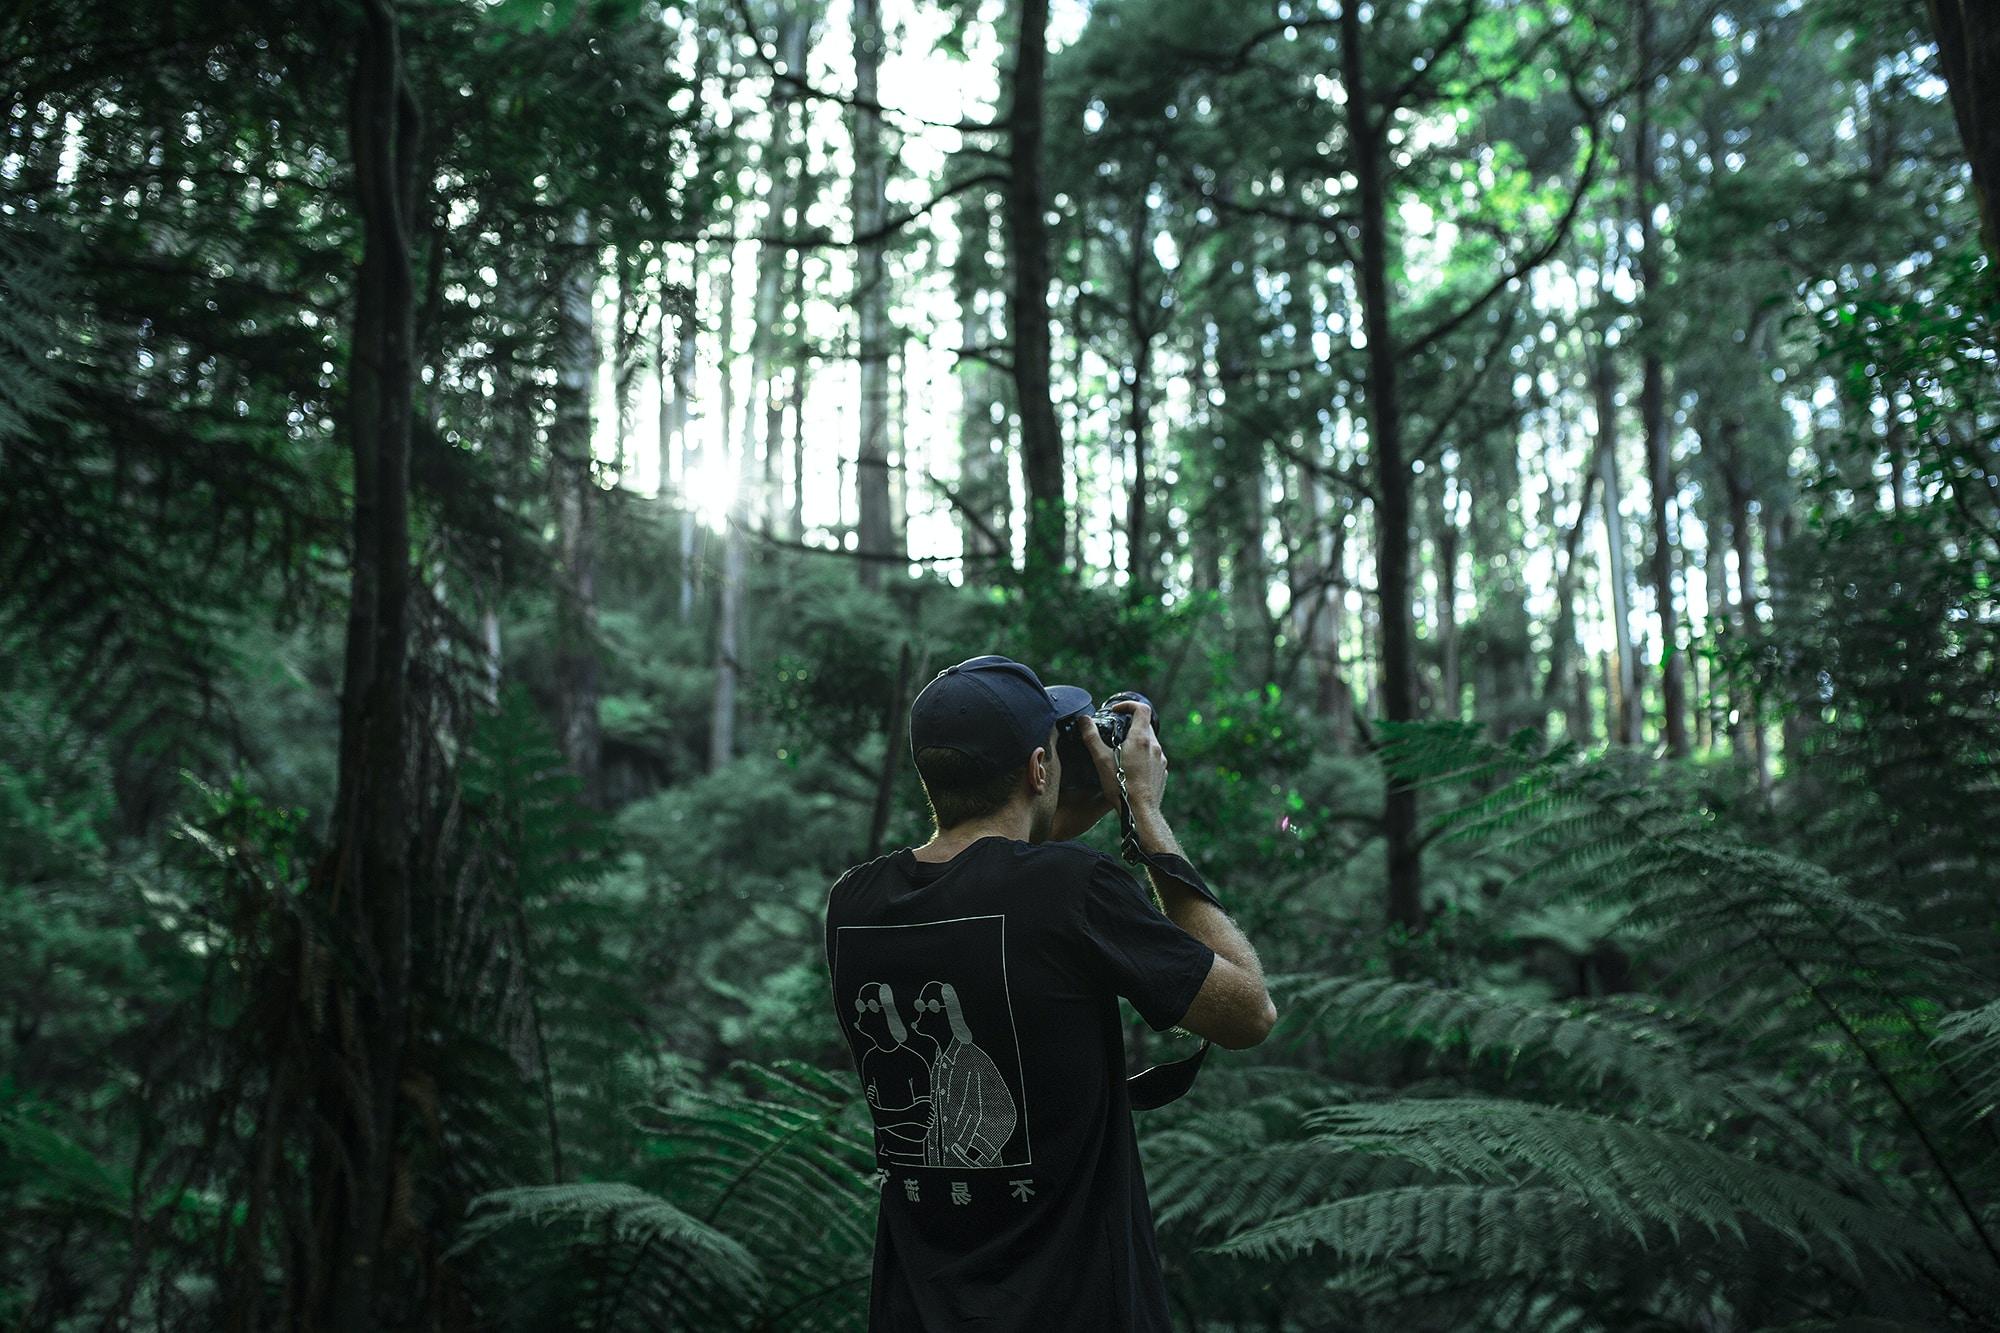 Mirrorless vs DSLR for landscape photography